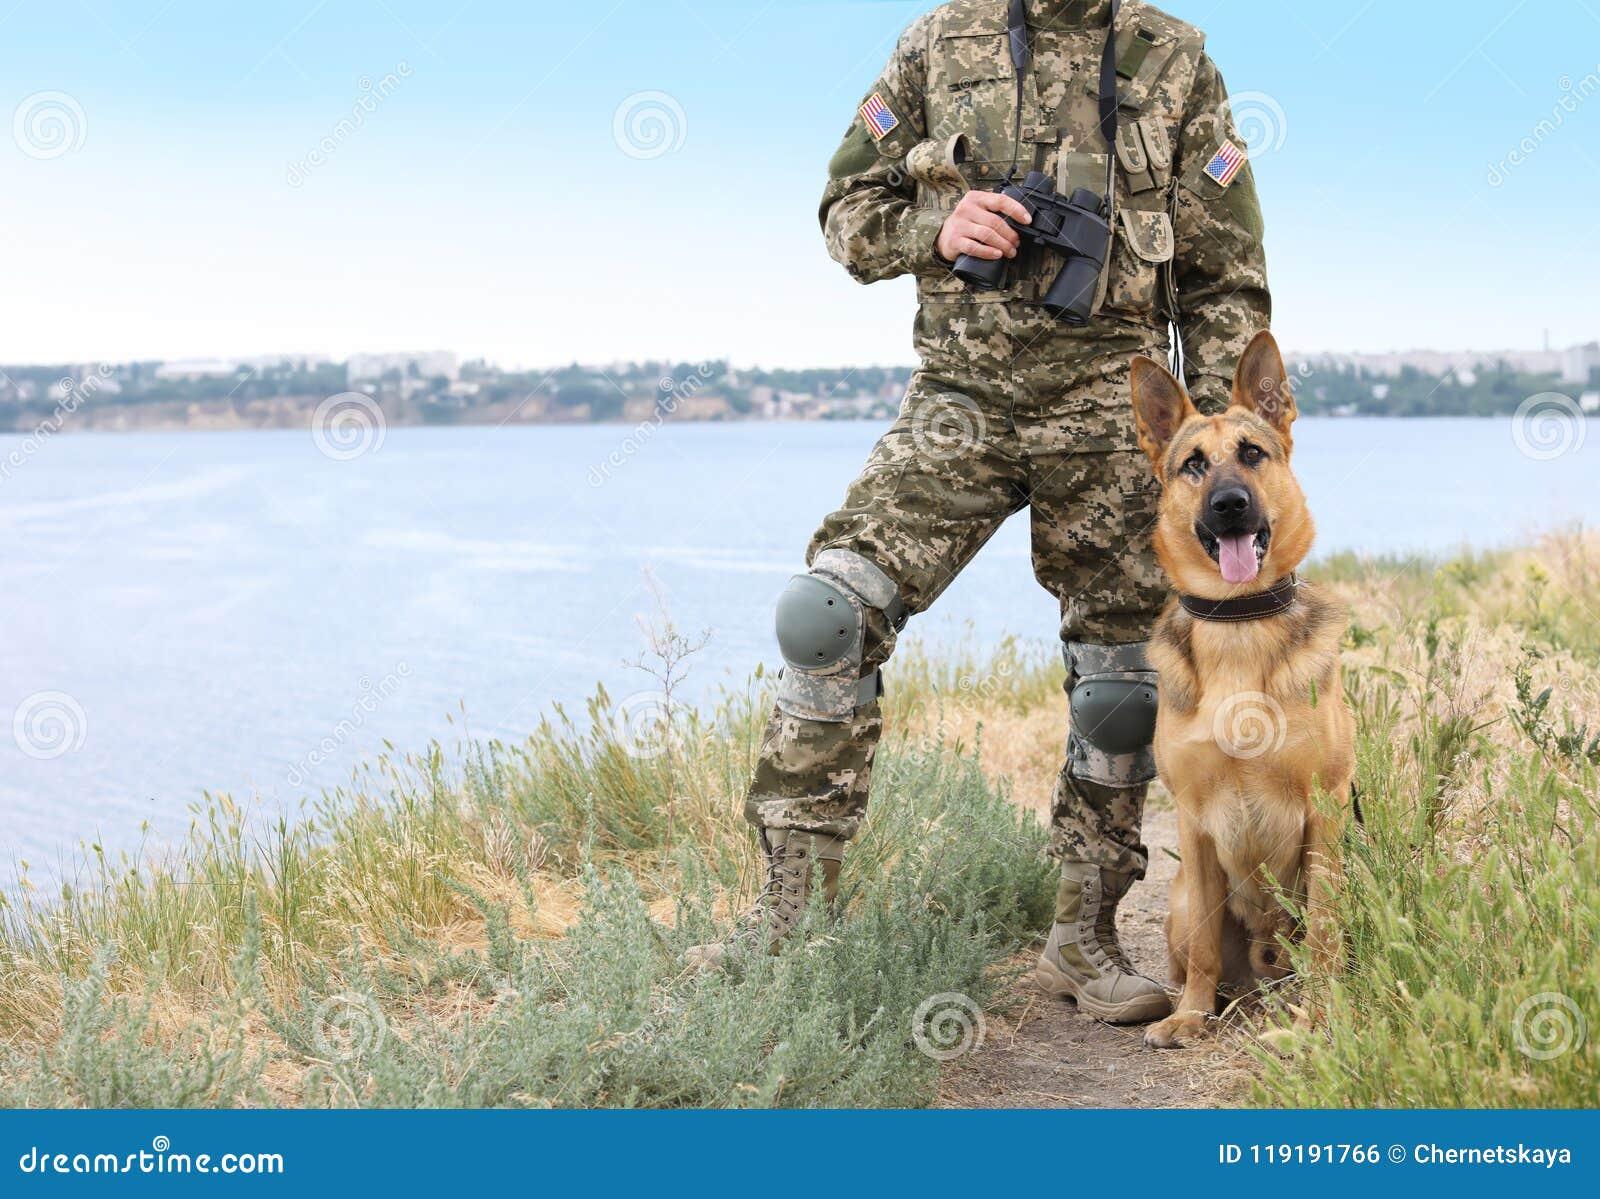 Man In Military Uniform With German Shepherd Dog Stock Photo Image